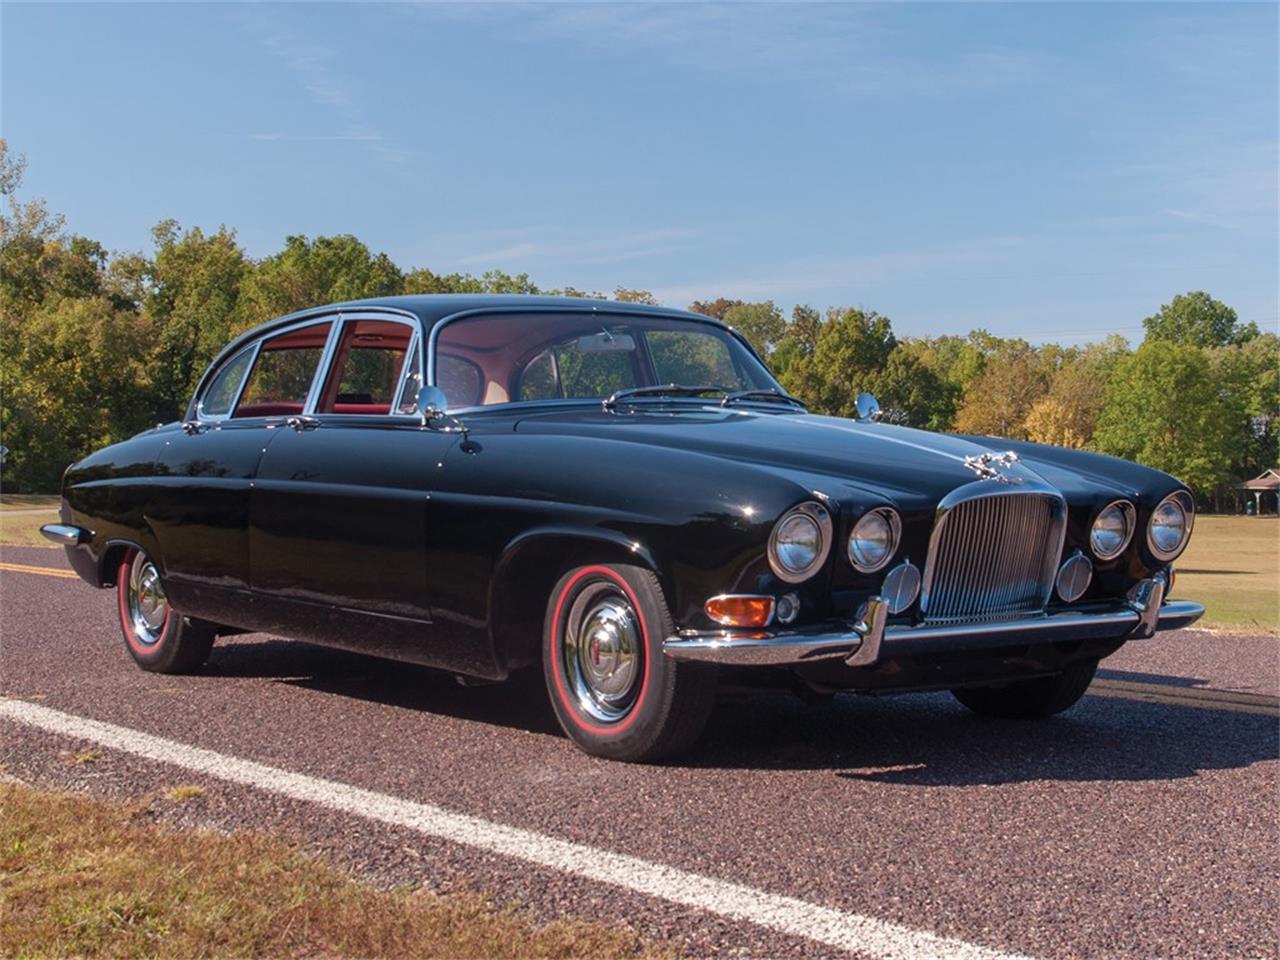 1964 Jaguar Mark X for sale in Auburn, IN / classiccarsbay.com